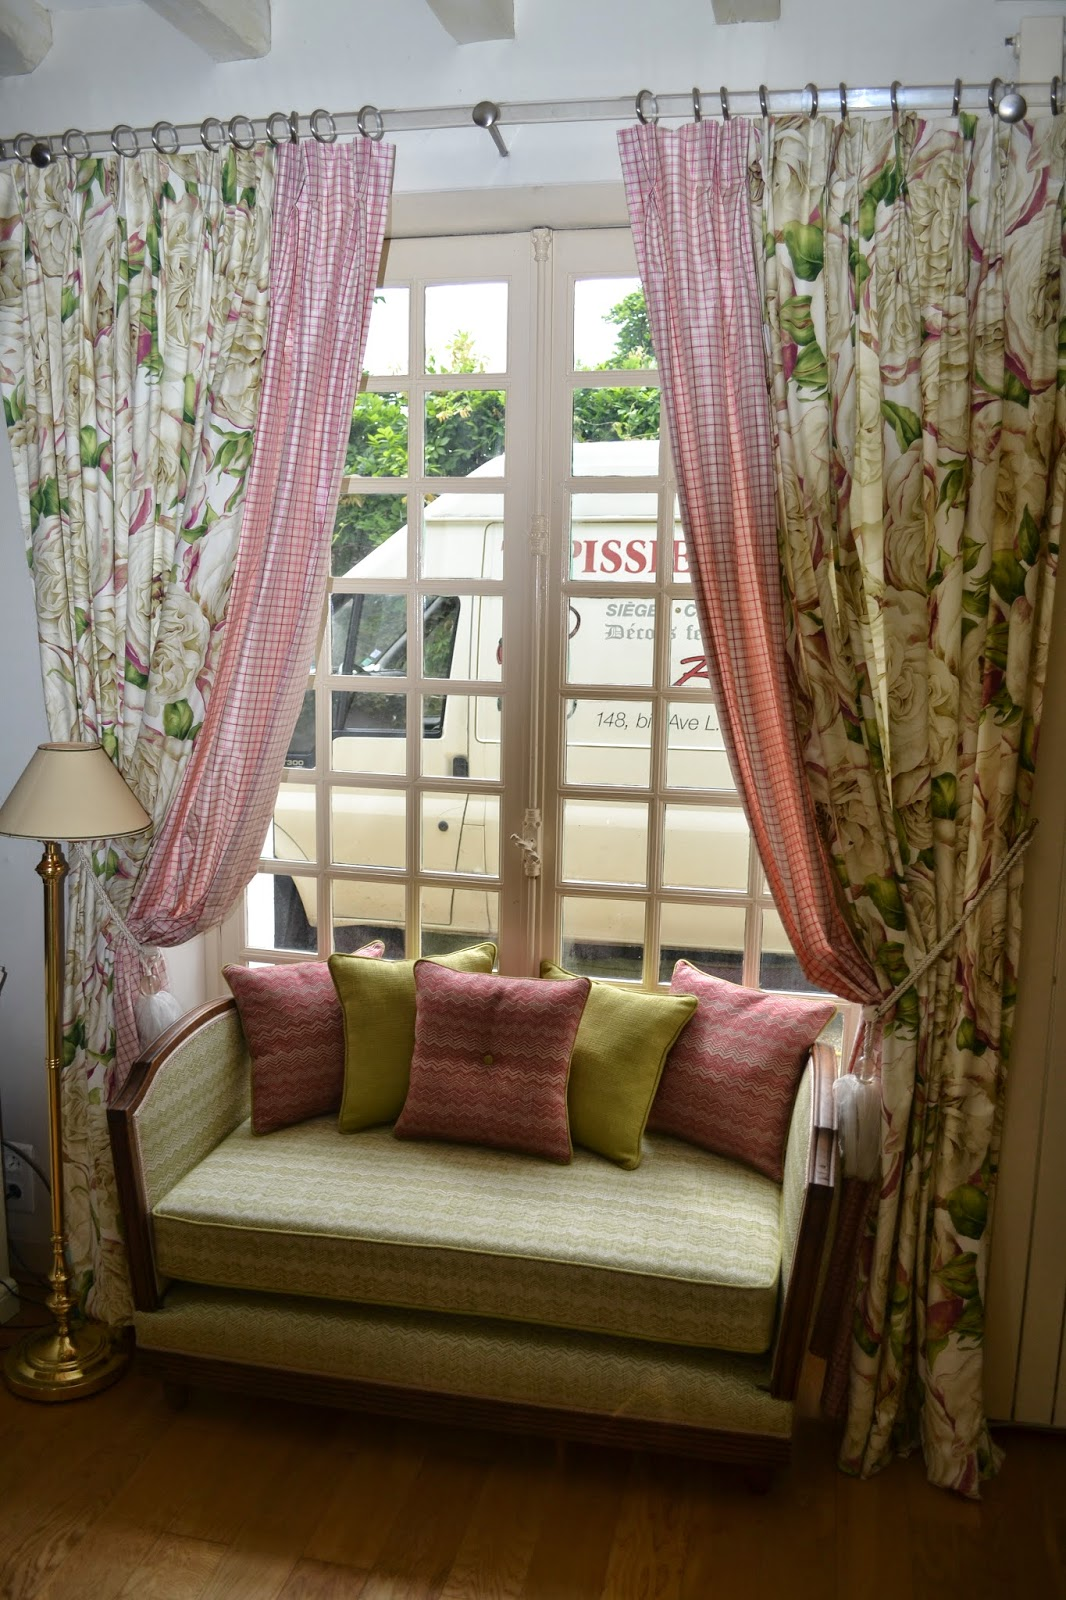 tapissier decorateur bruno pinard derni res r alisations si ges et rideaux etc. Black Bedroom Furniture Sets. Home Design Ideas